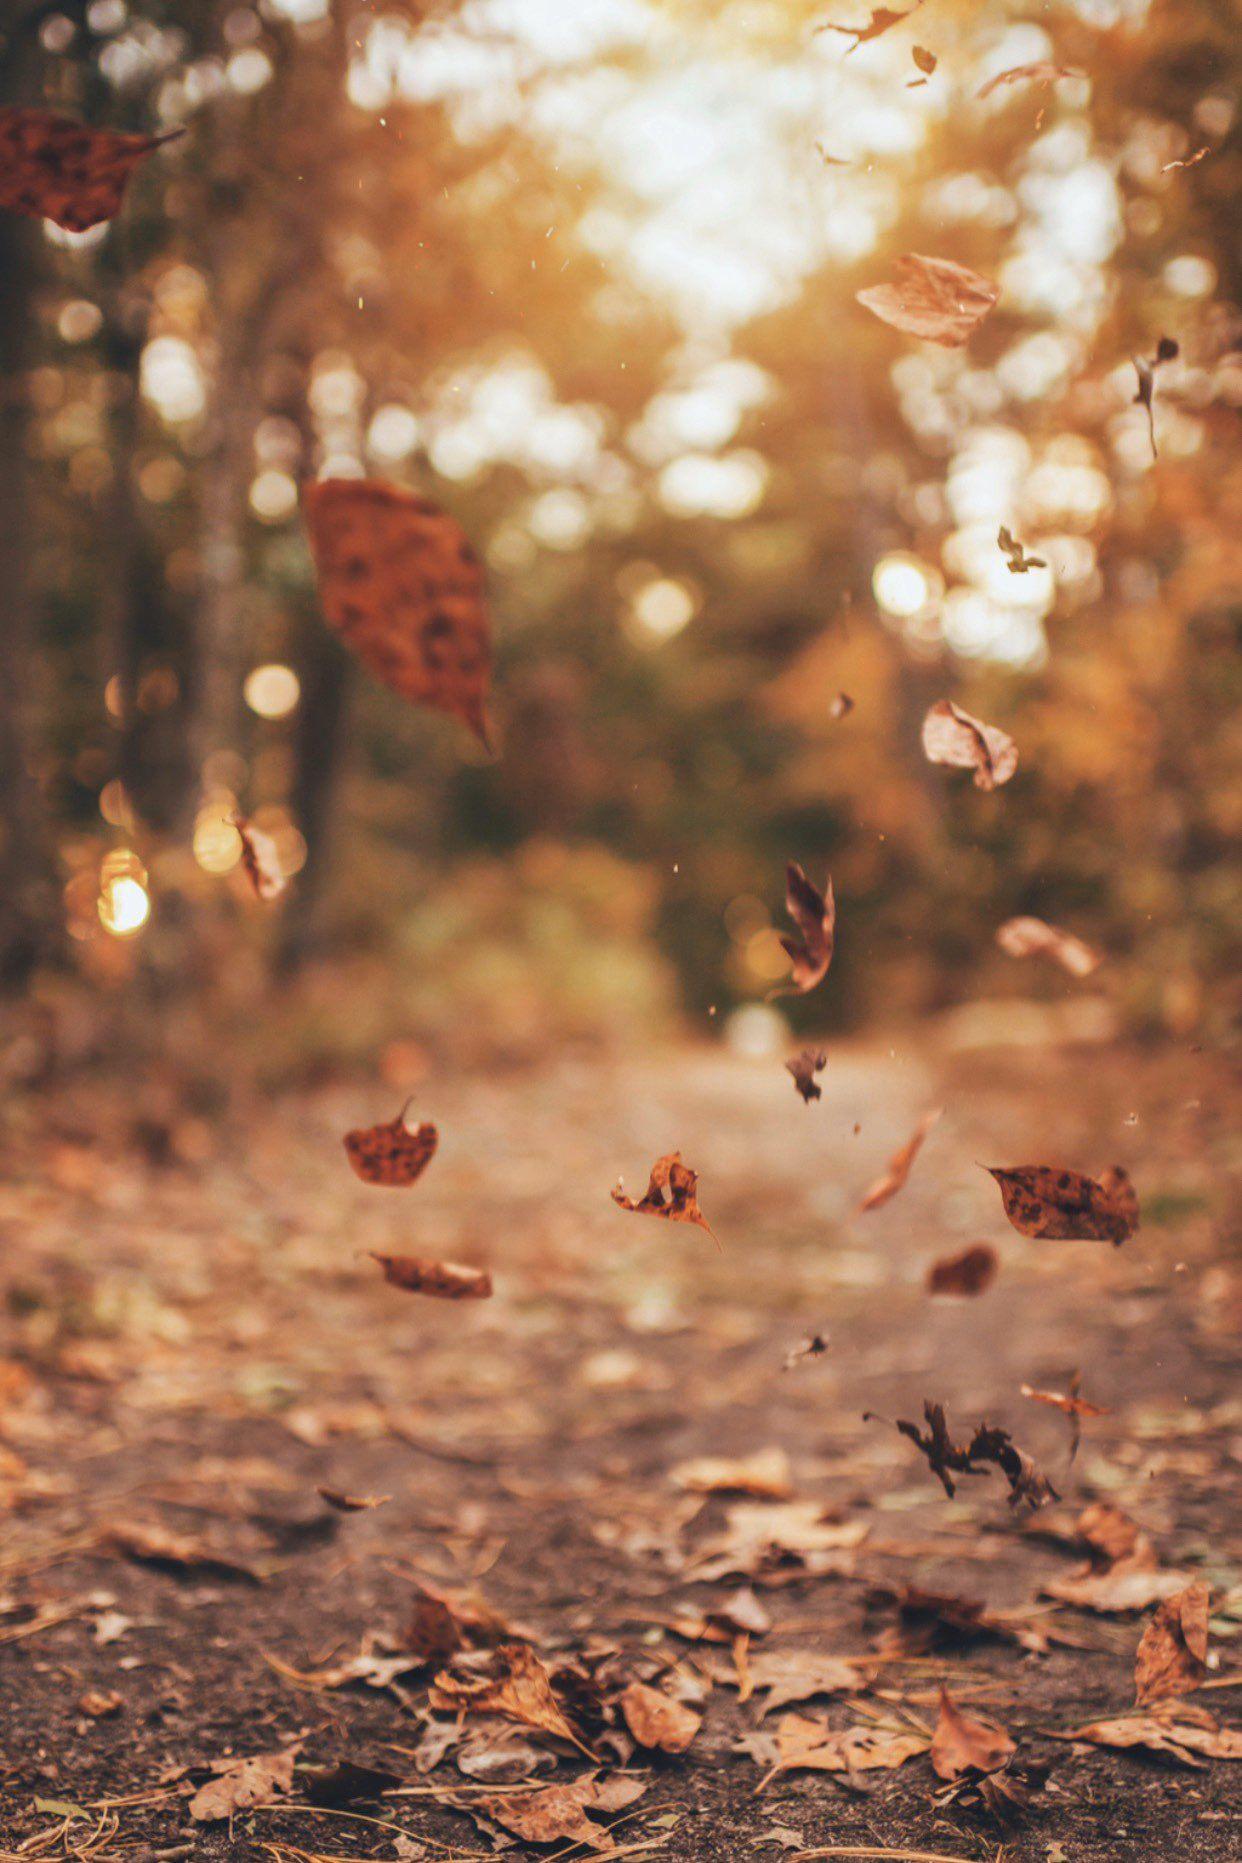 Brandon Woelfel On Twitter Autumn Leaves Wallpaper Fall Wallpaper Tumblr Photography Wallpaper